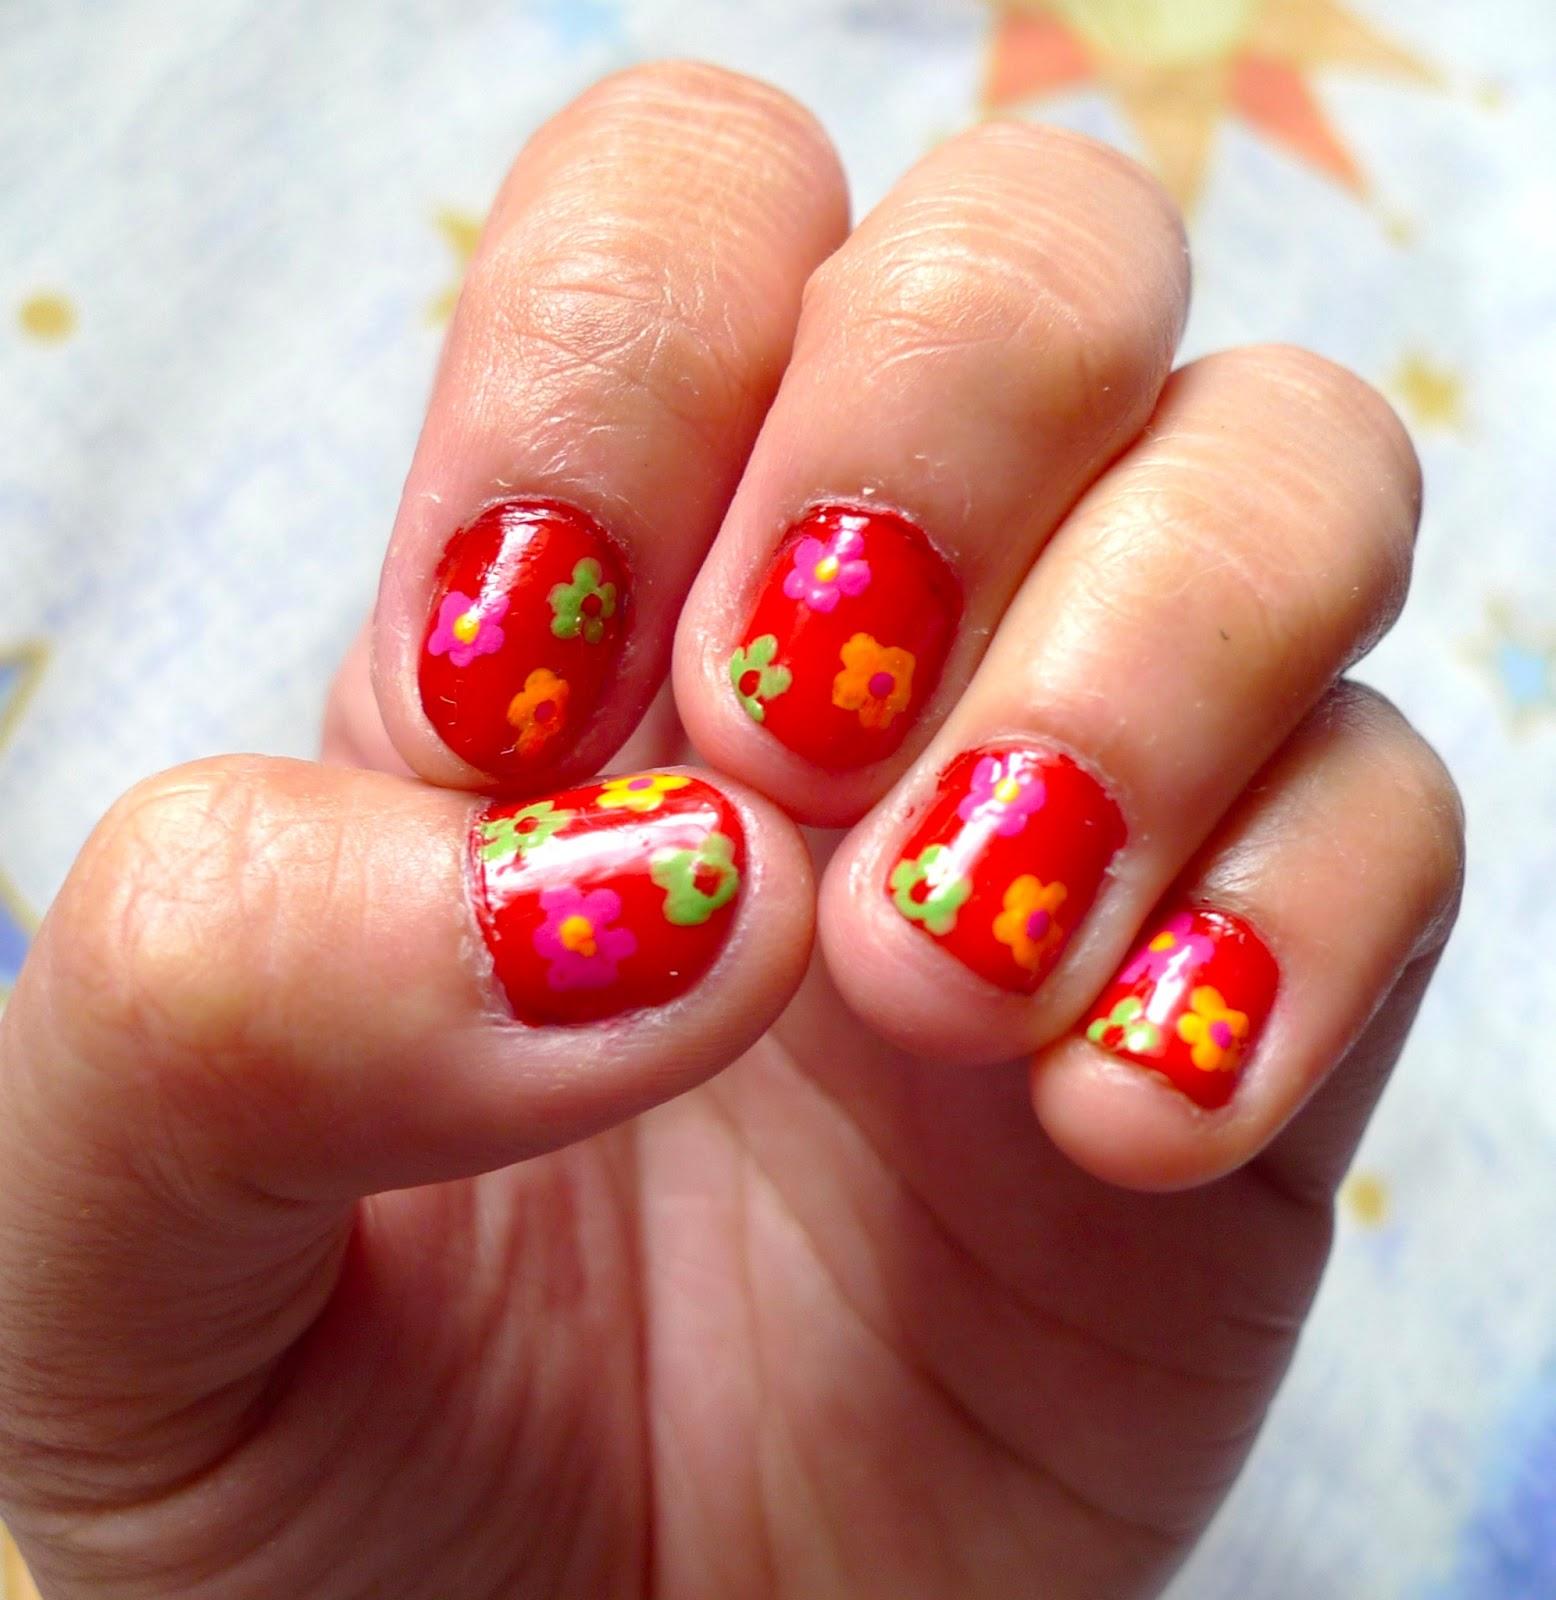 Nail Art Tutorials: Nail Art Tutorial: Easy Flower Bouquet Nails For Valentine